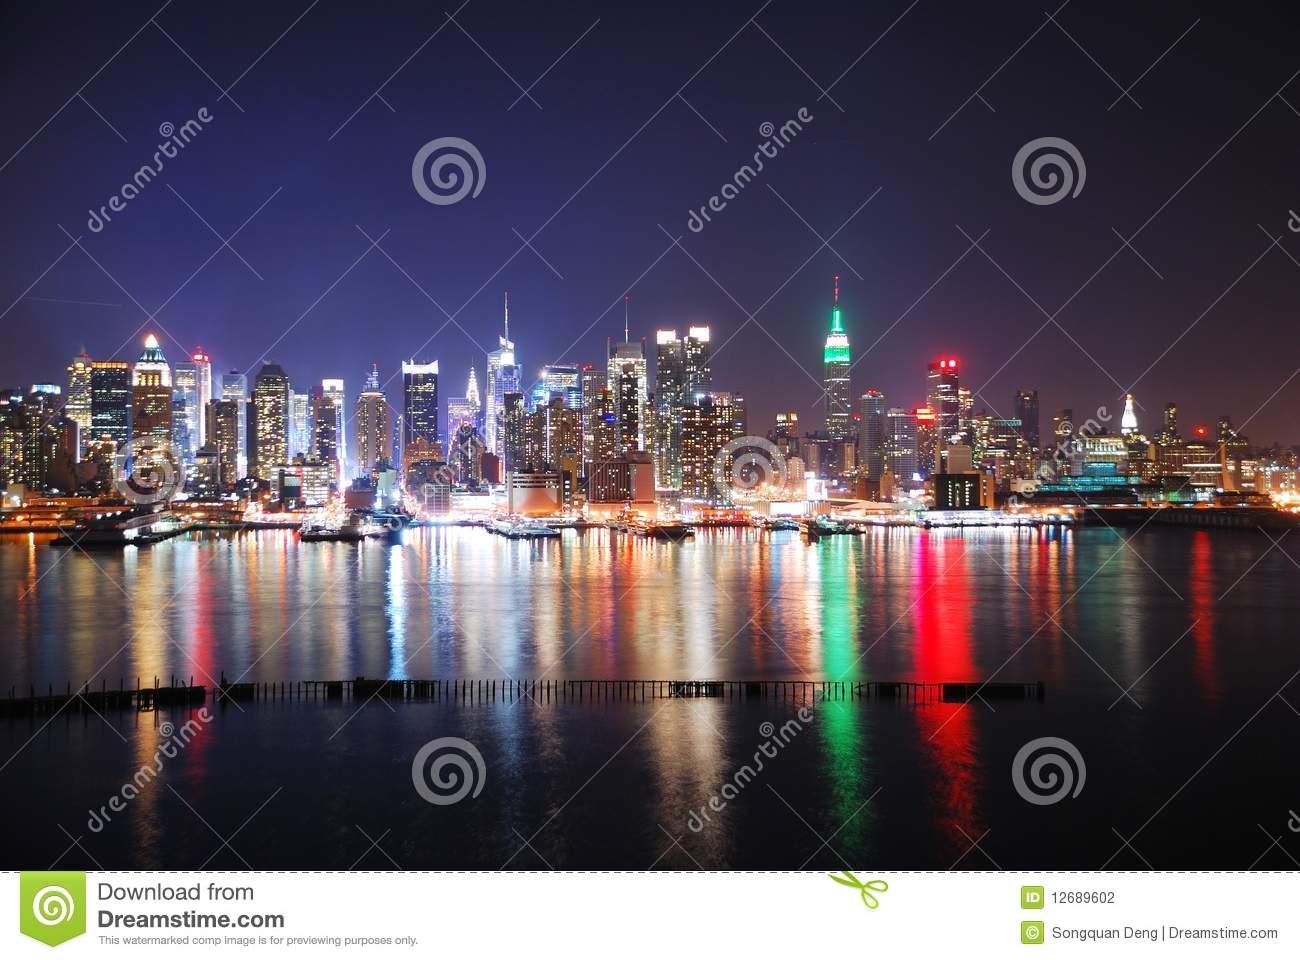 New york city night clipart.